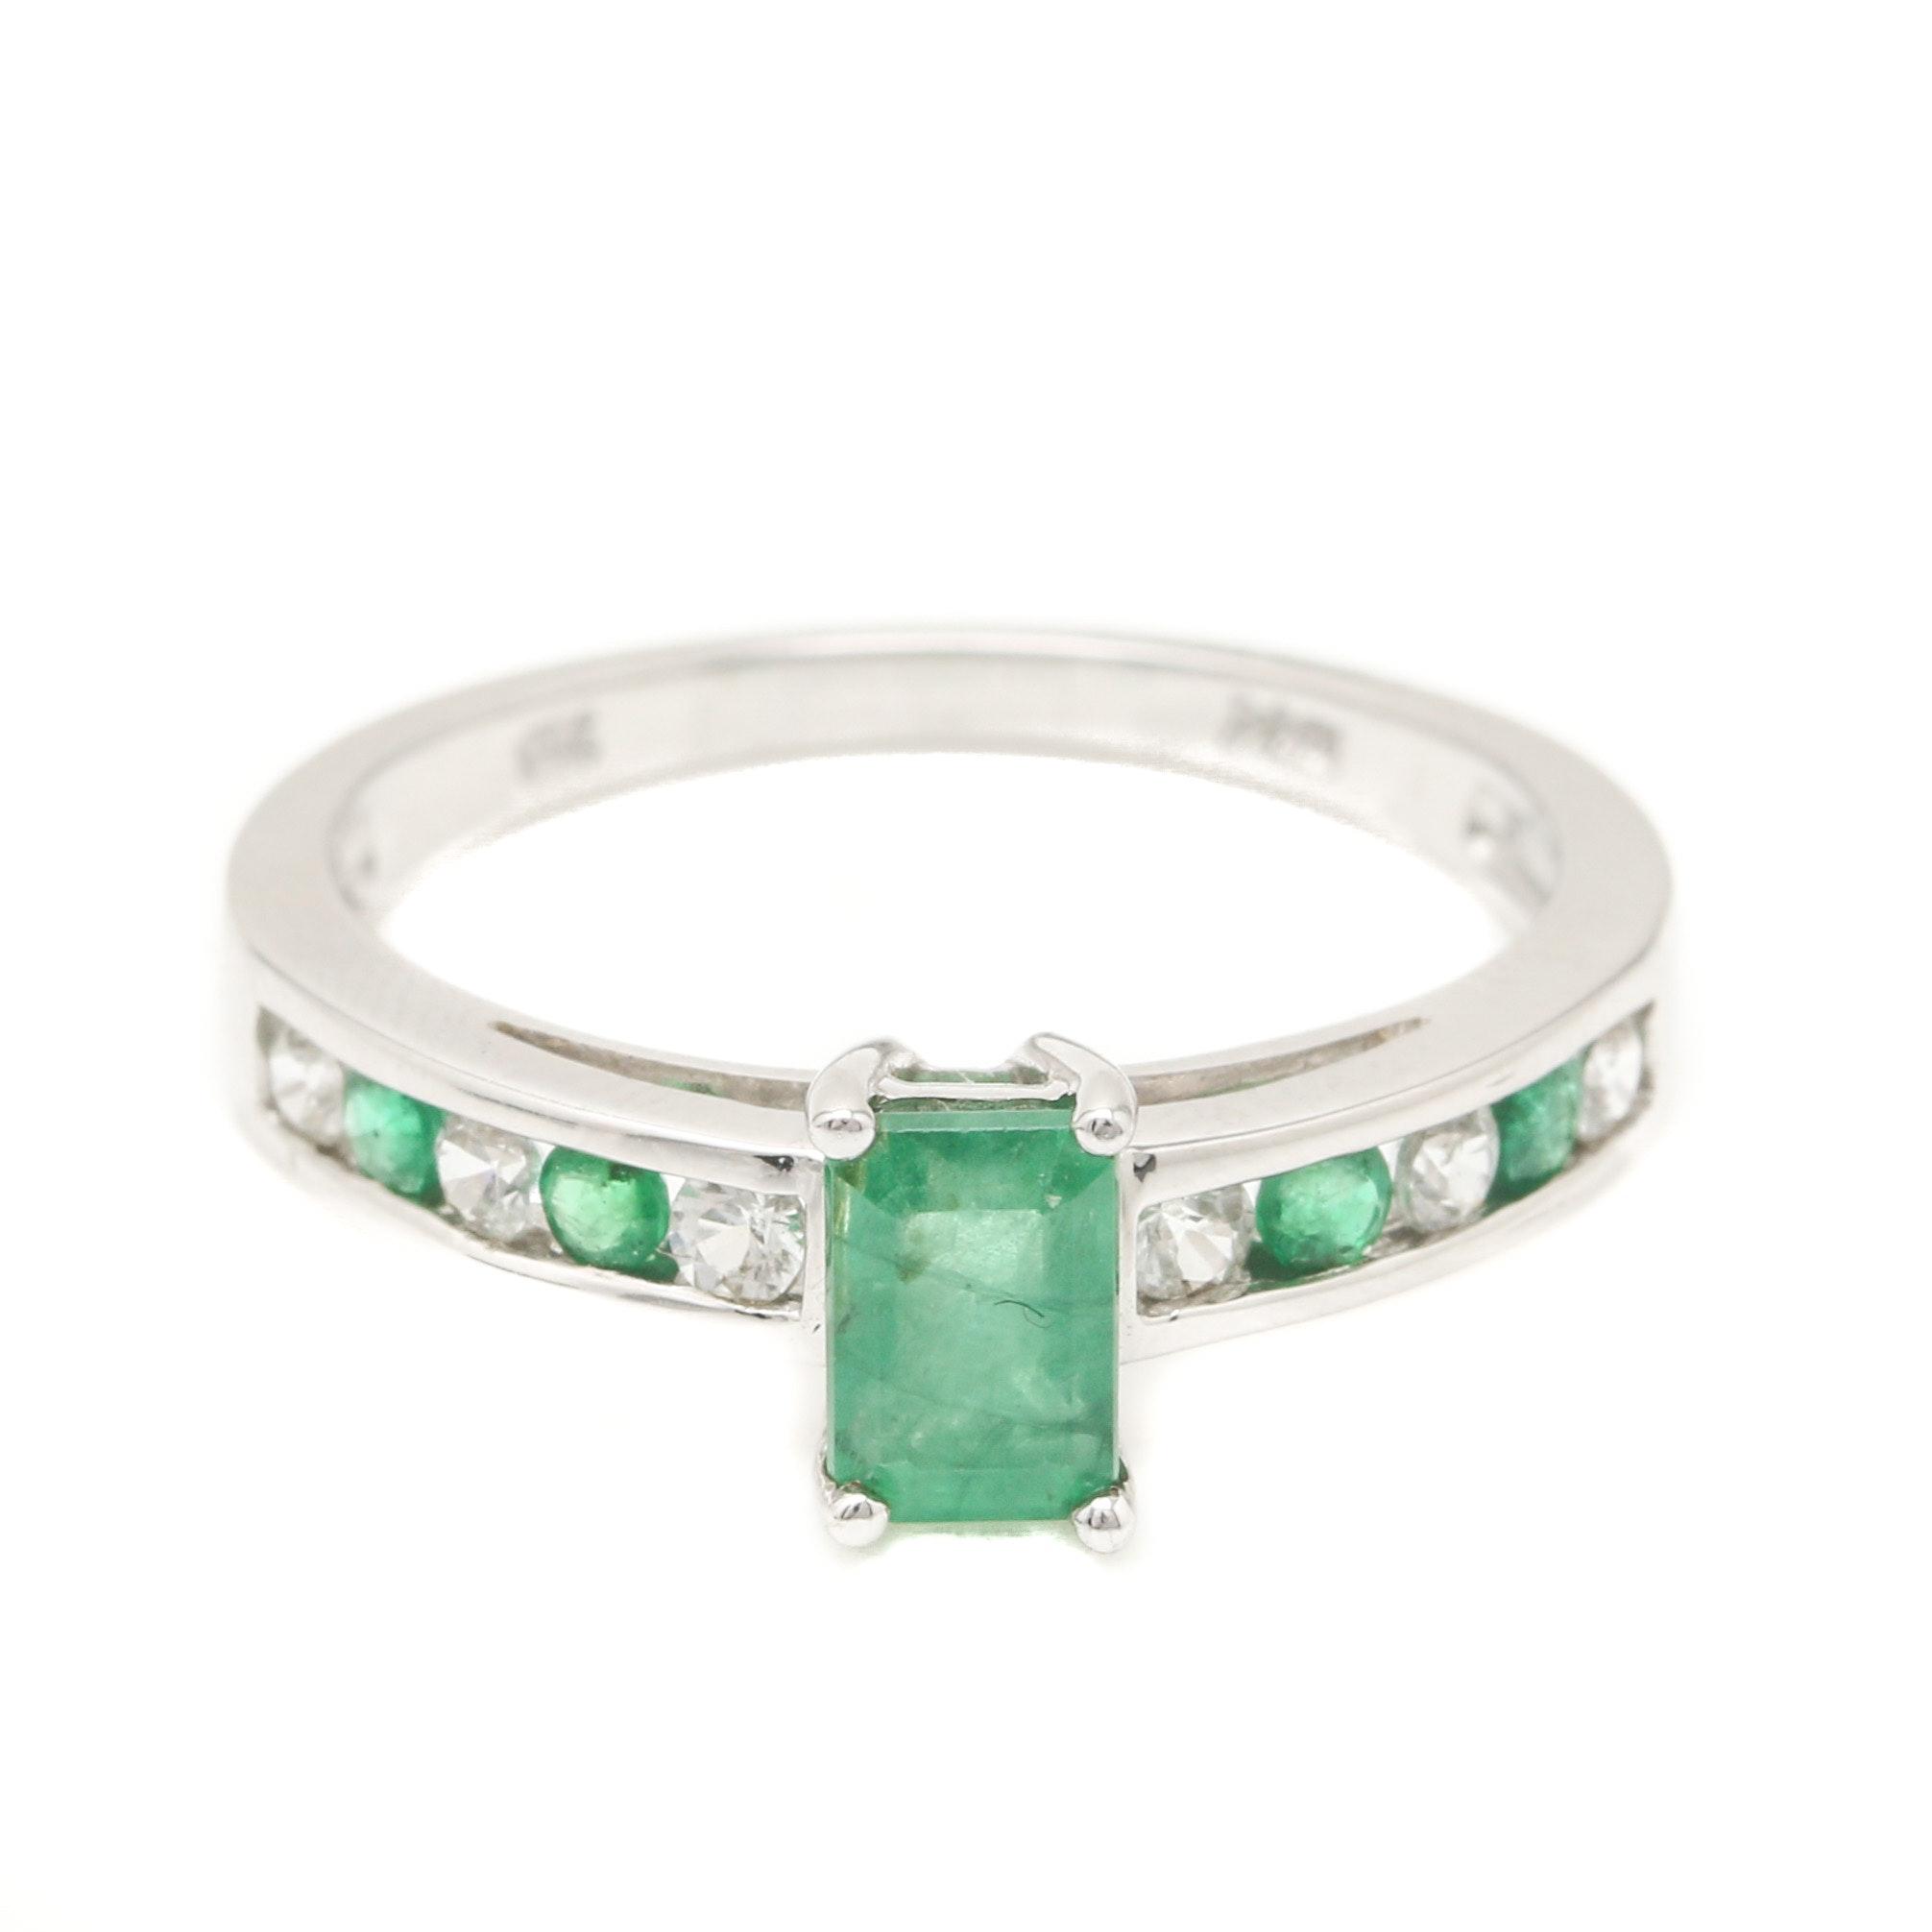 10K White Gold Emerald and White Topaz Ring